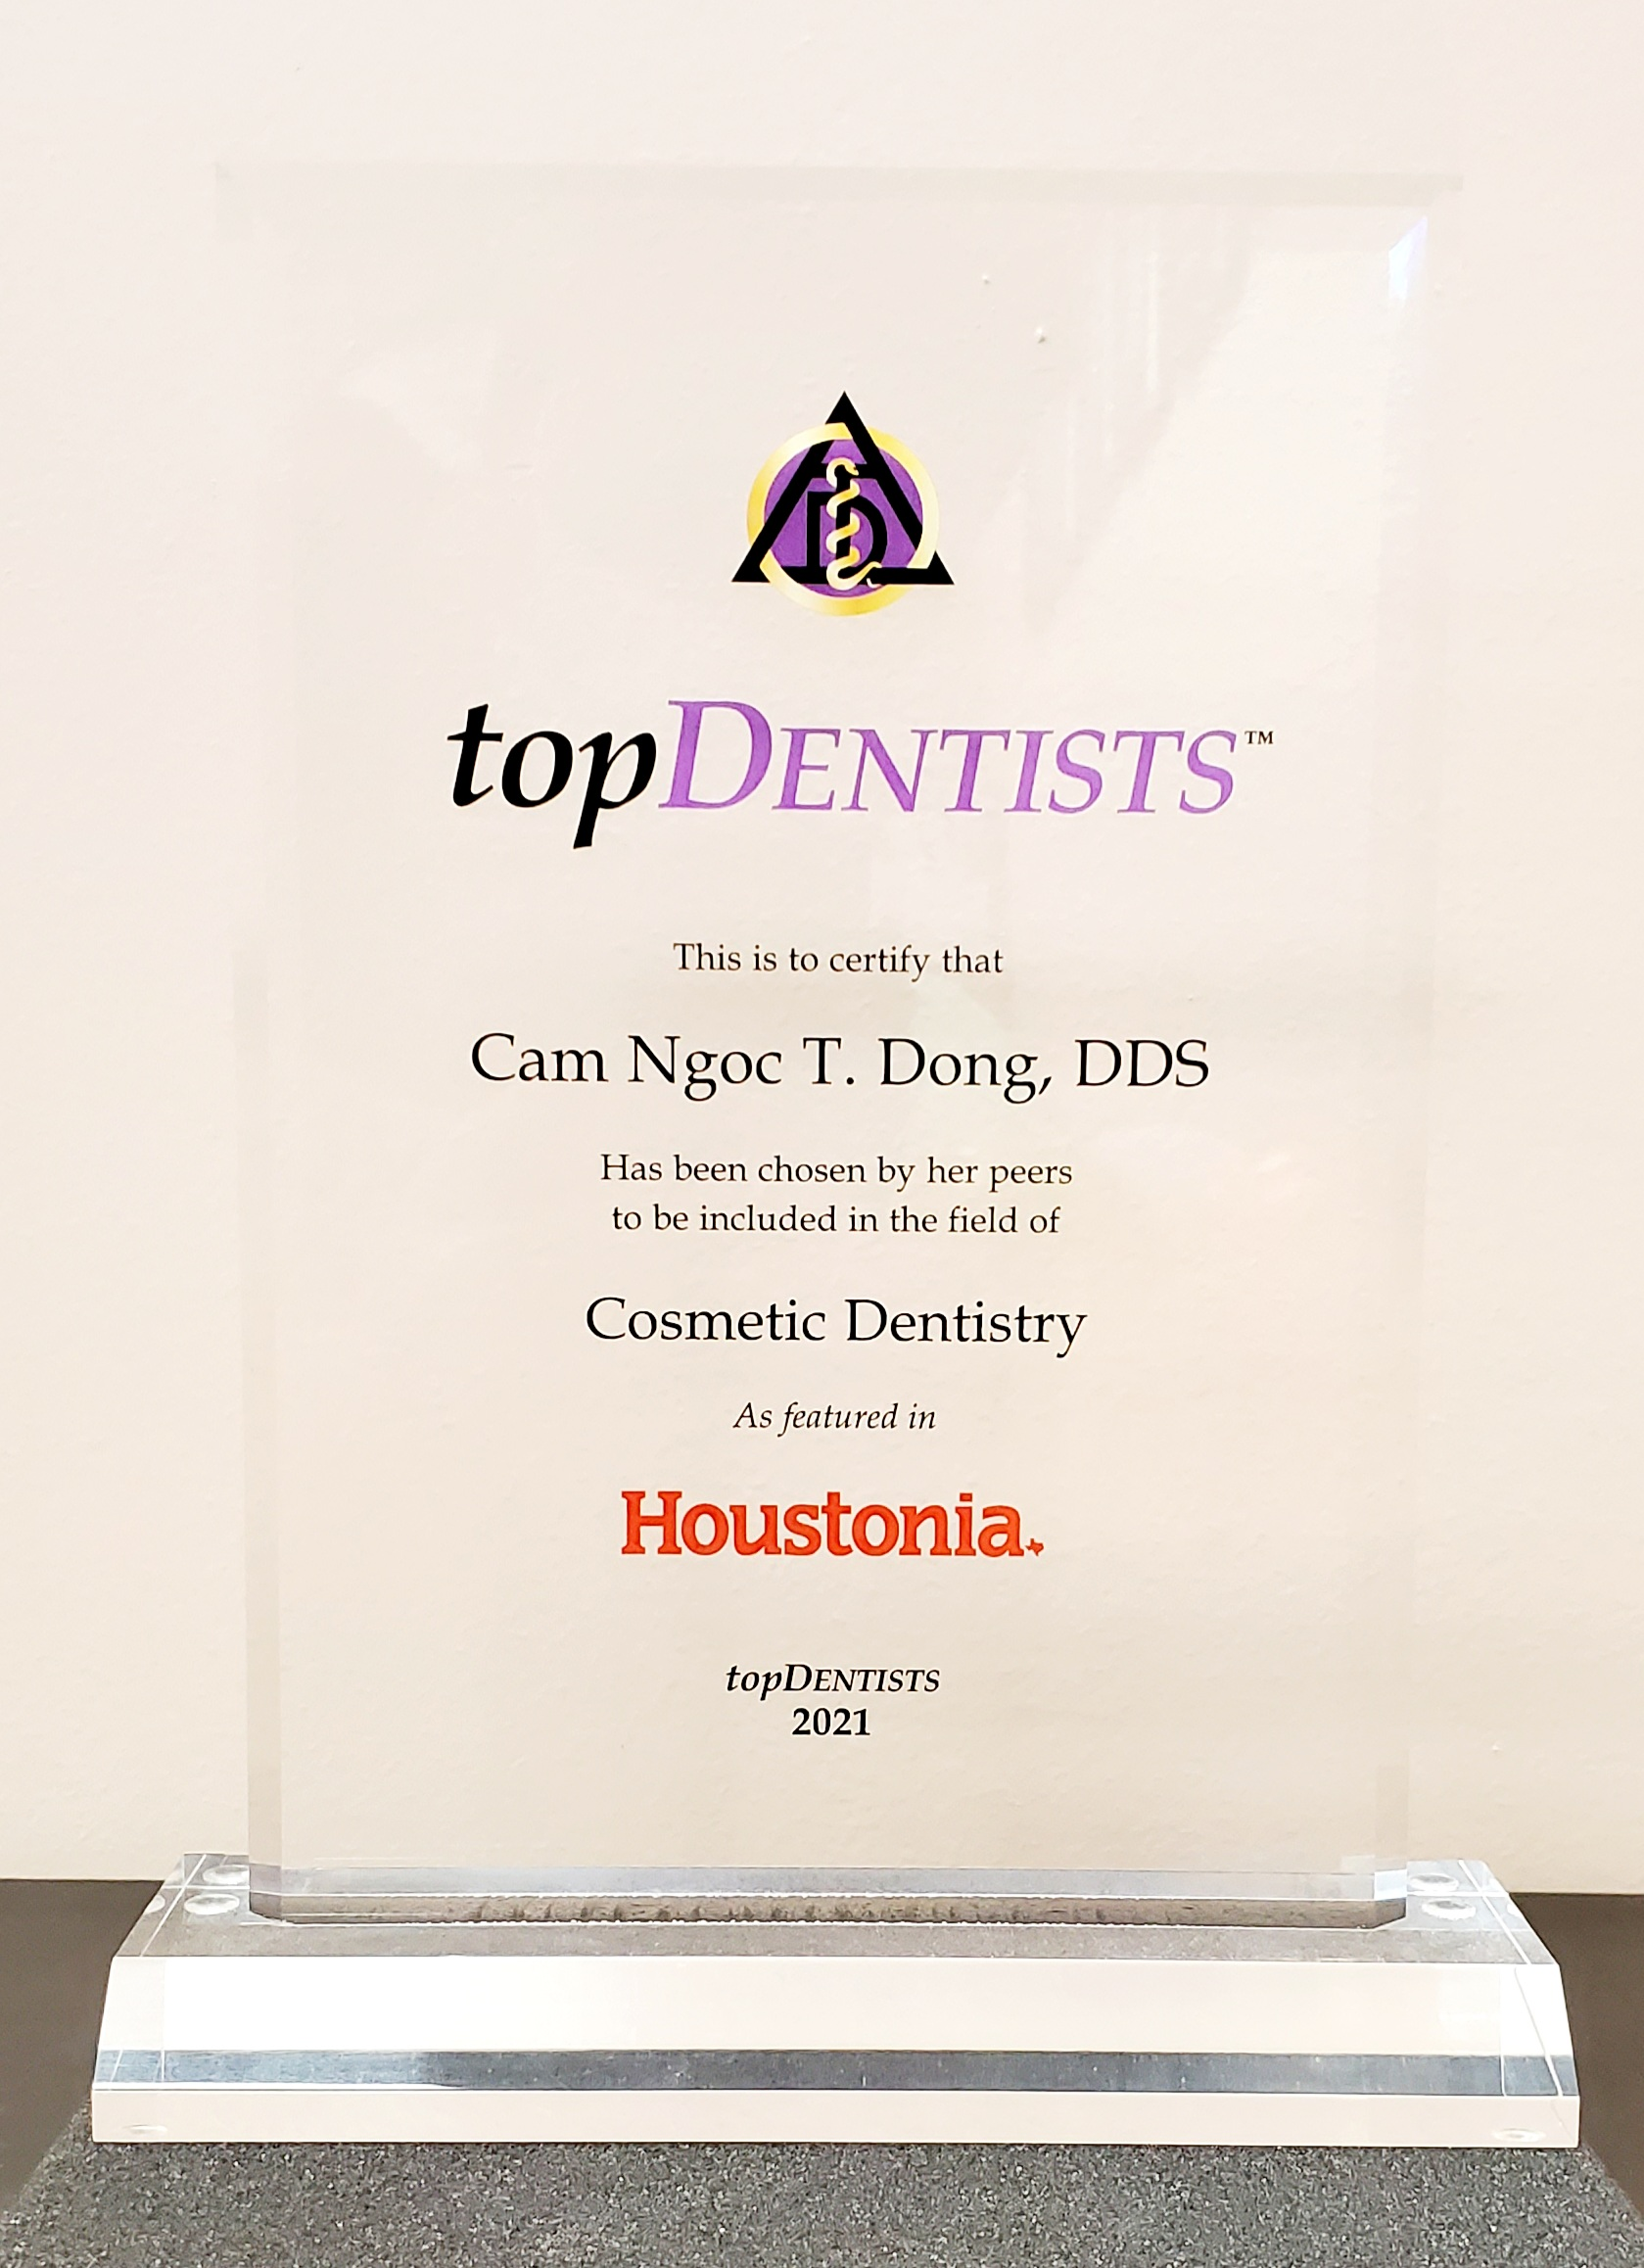 Top Dentists Trophy Award